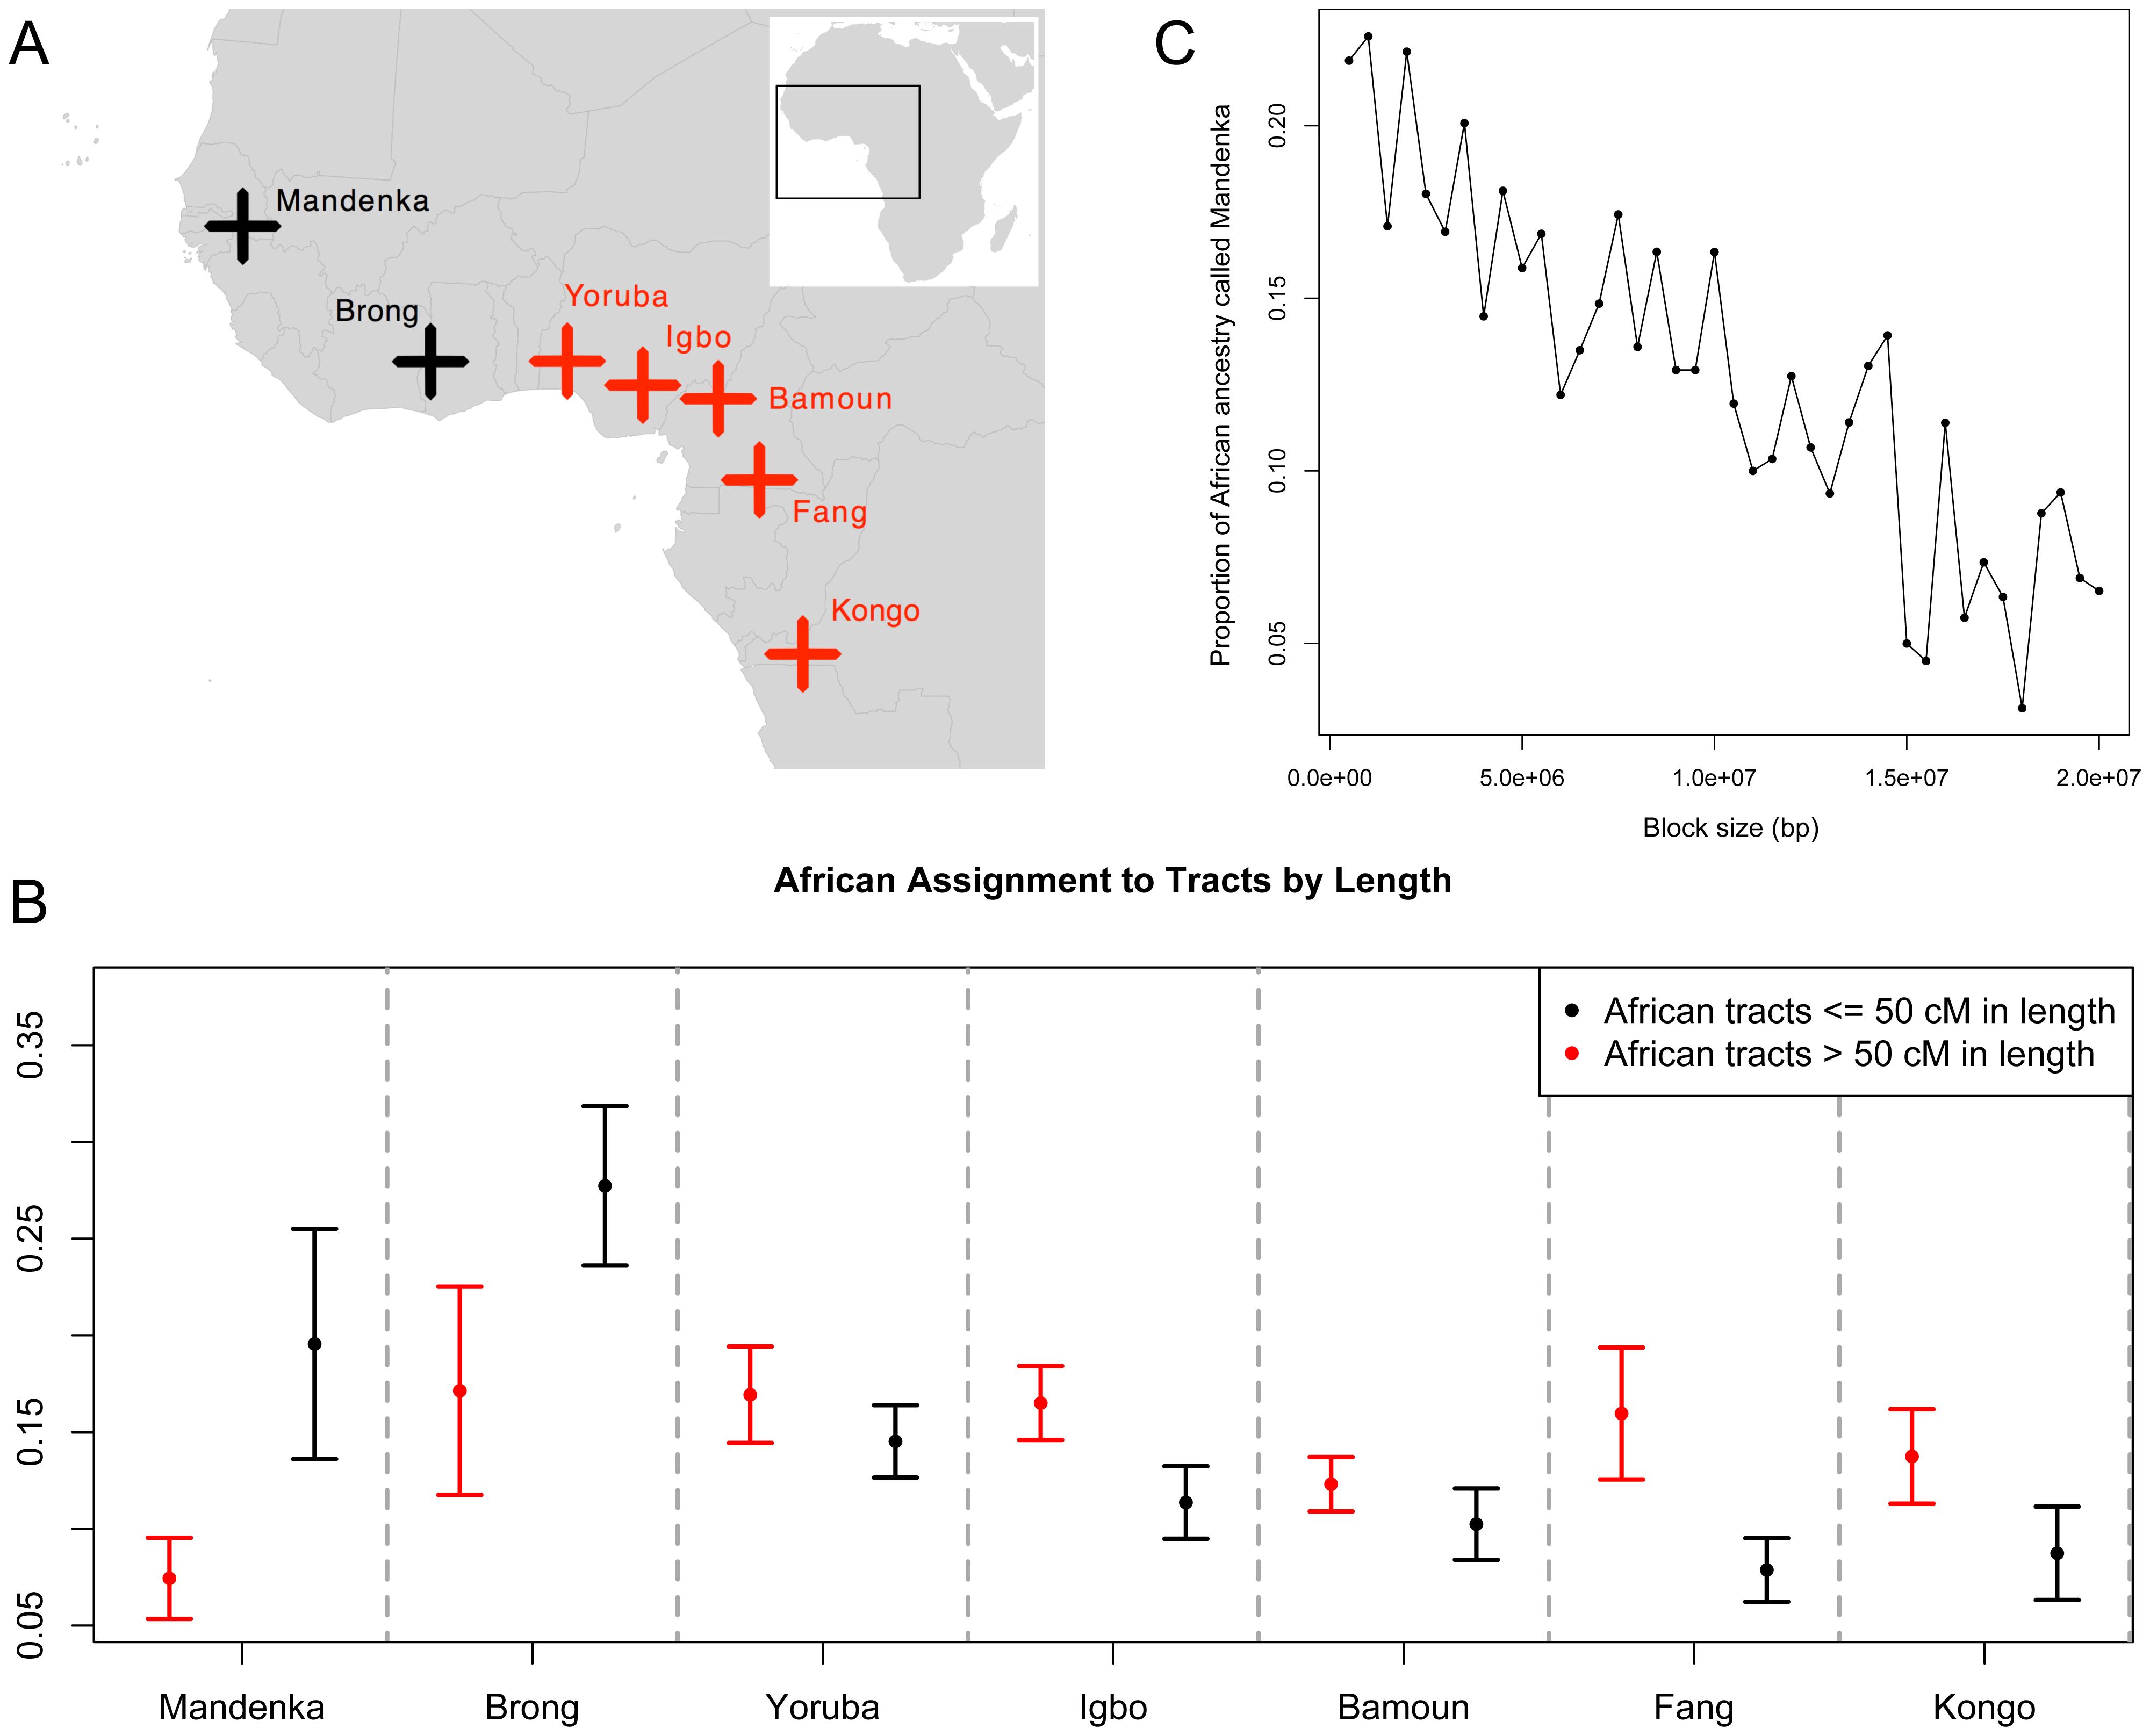 Sub-continental origin of Afro-Caribbean haplotypes of different sizes.